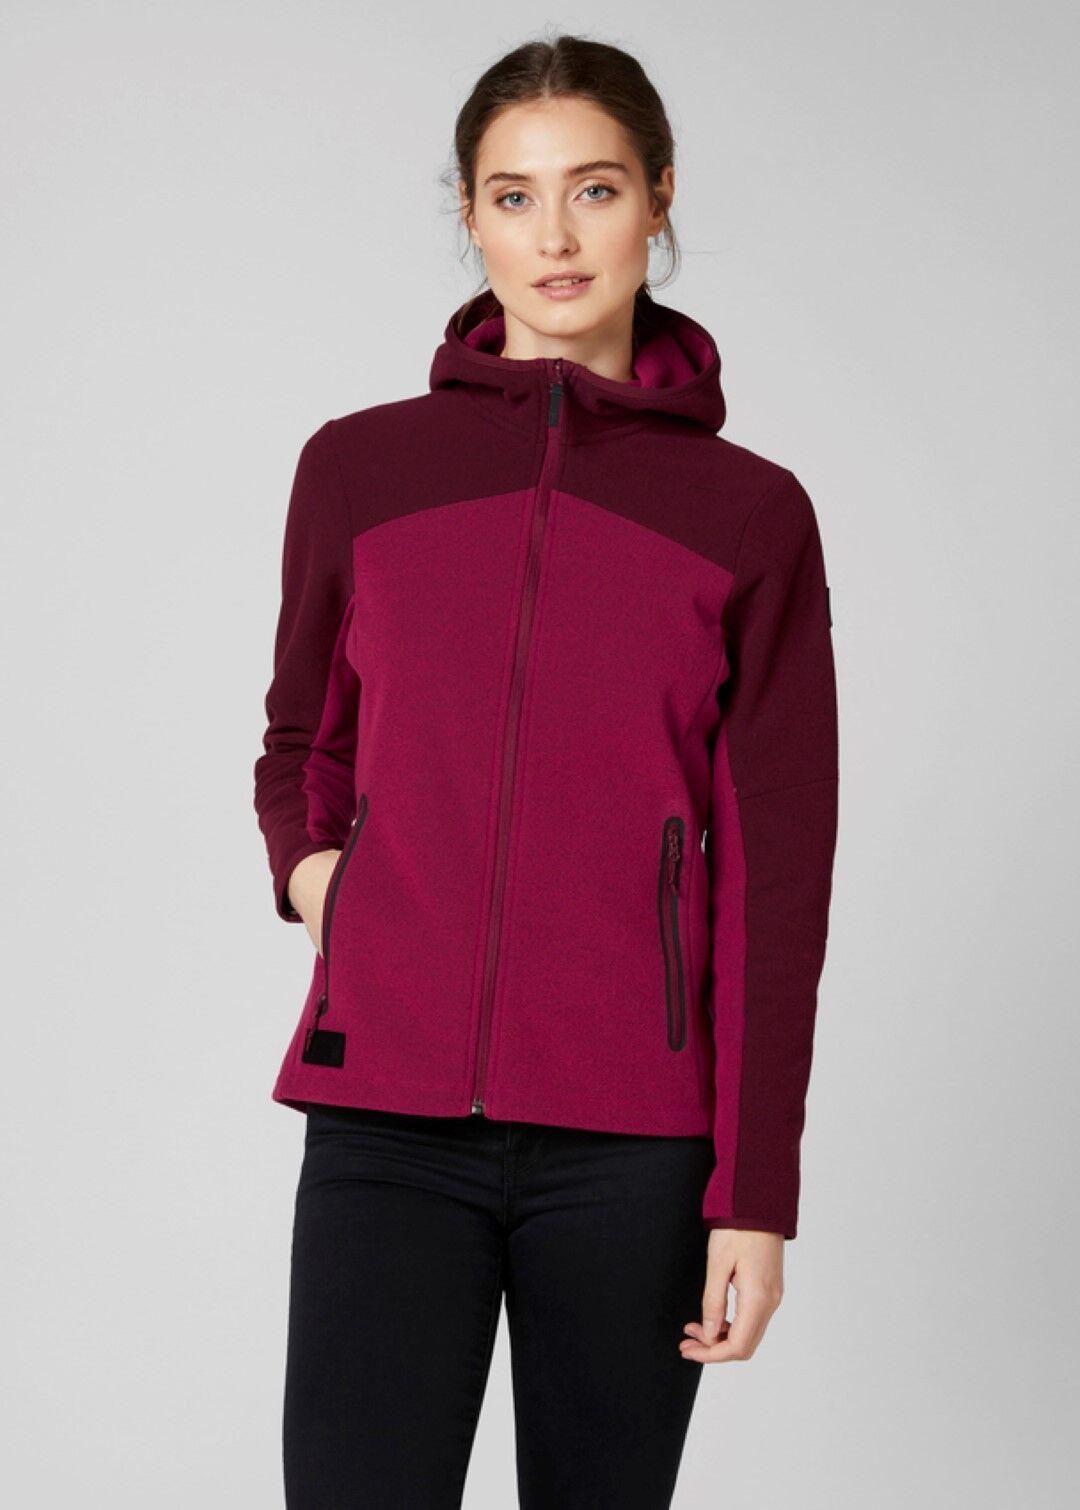 9b42df09 Helly Hansen W Vanir Fleece Jacket Persian Red M | eBay